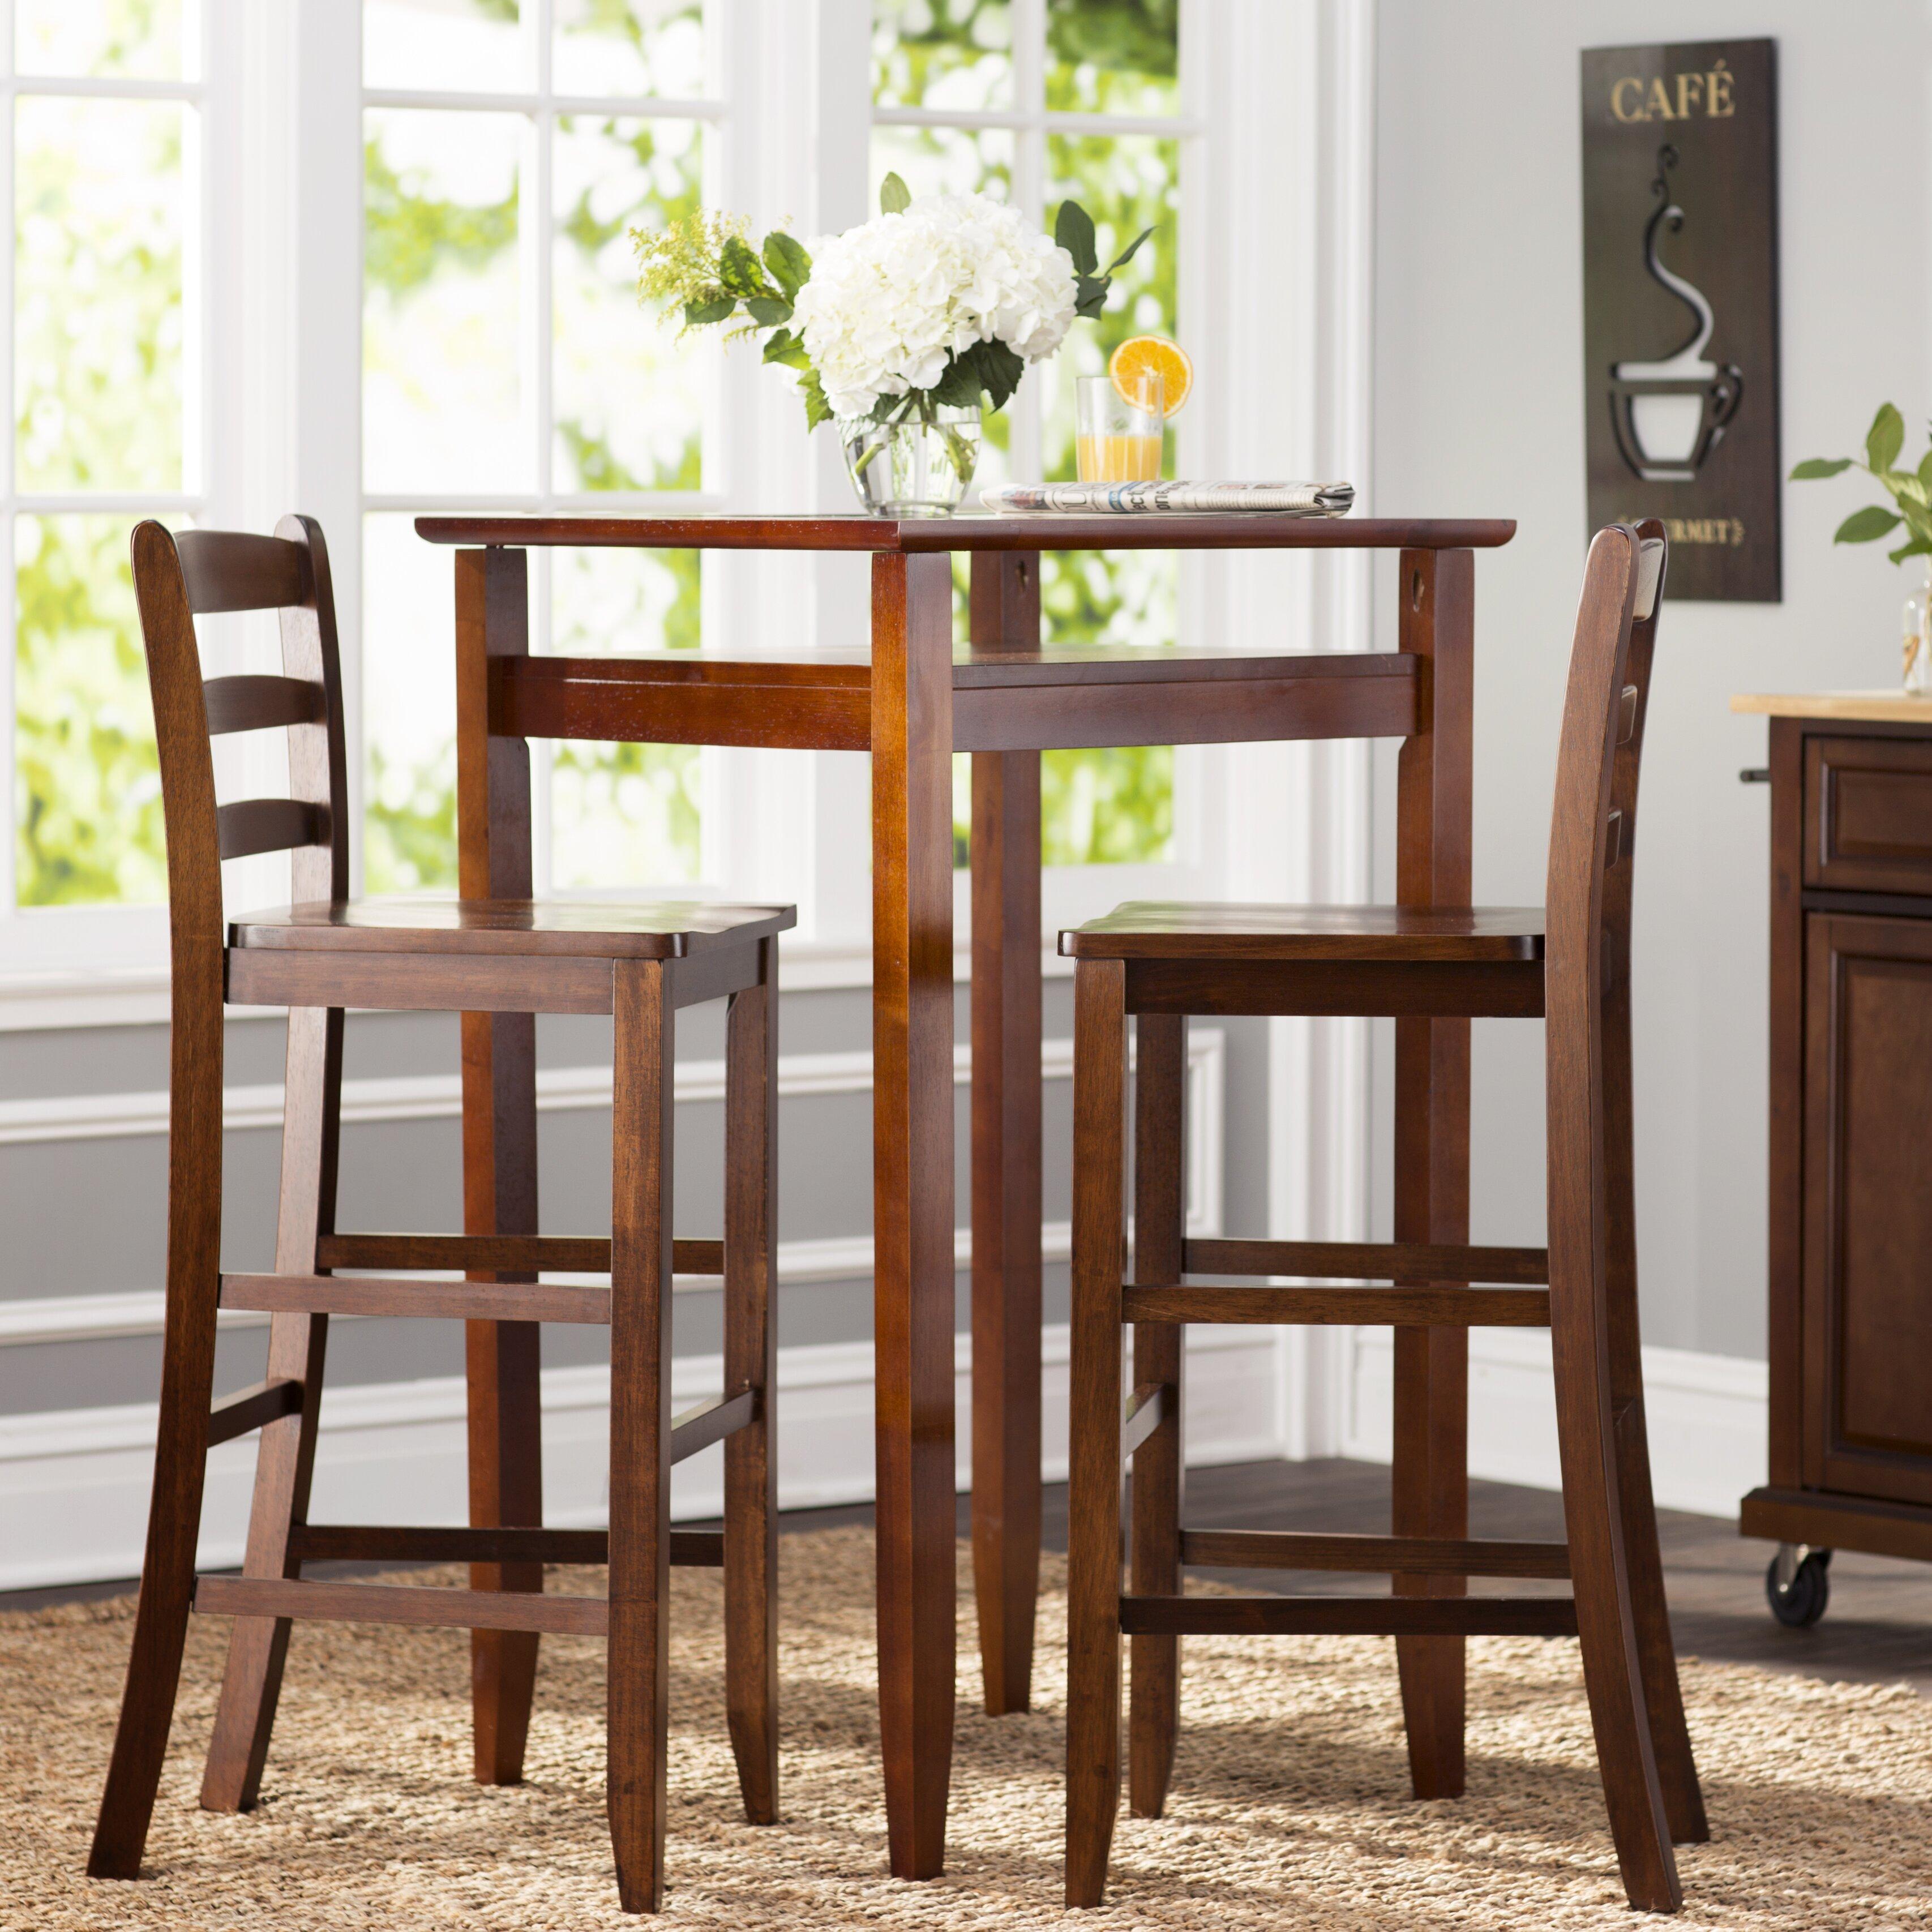 Kitchen Pub Table Sets Charlton Home Halo 3 Piece Pub Table Set Reviews Wayfair